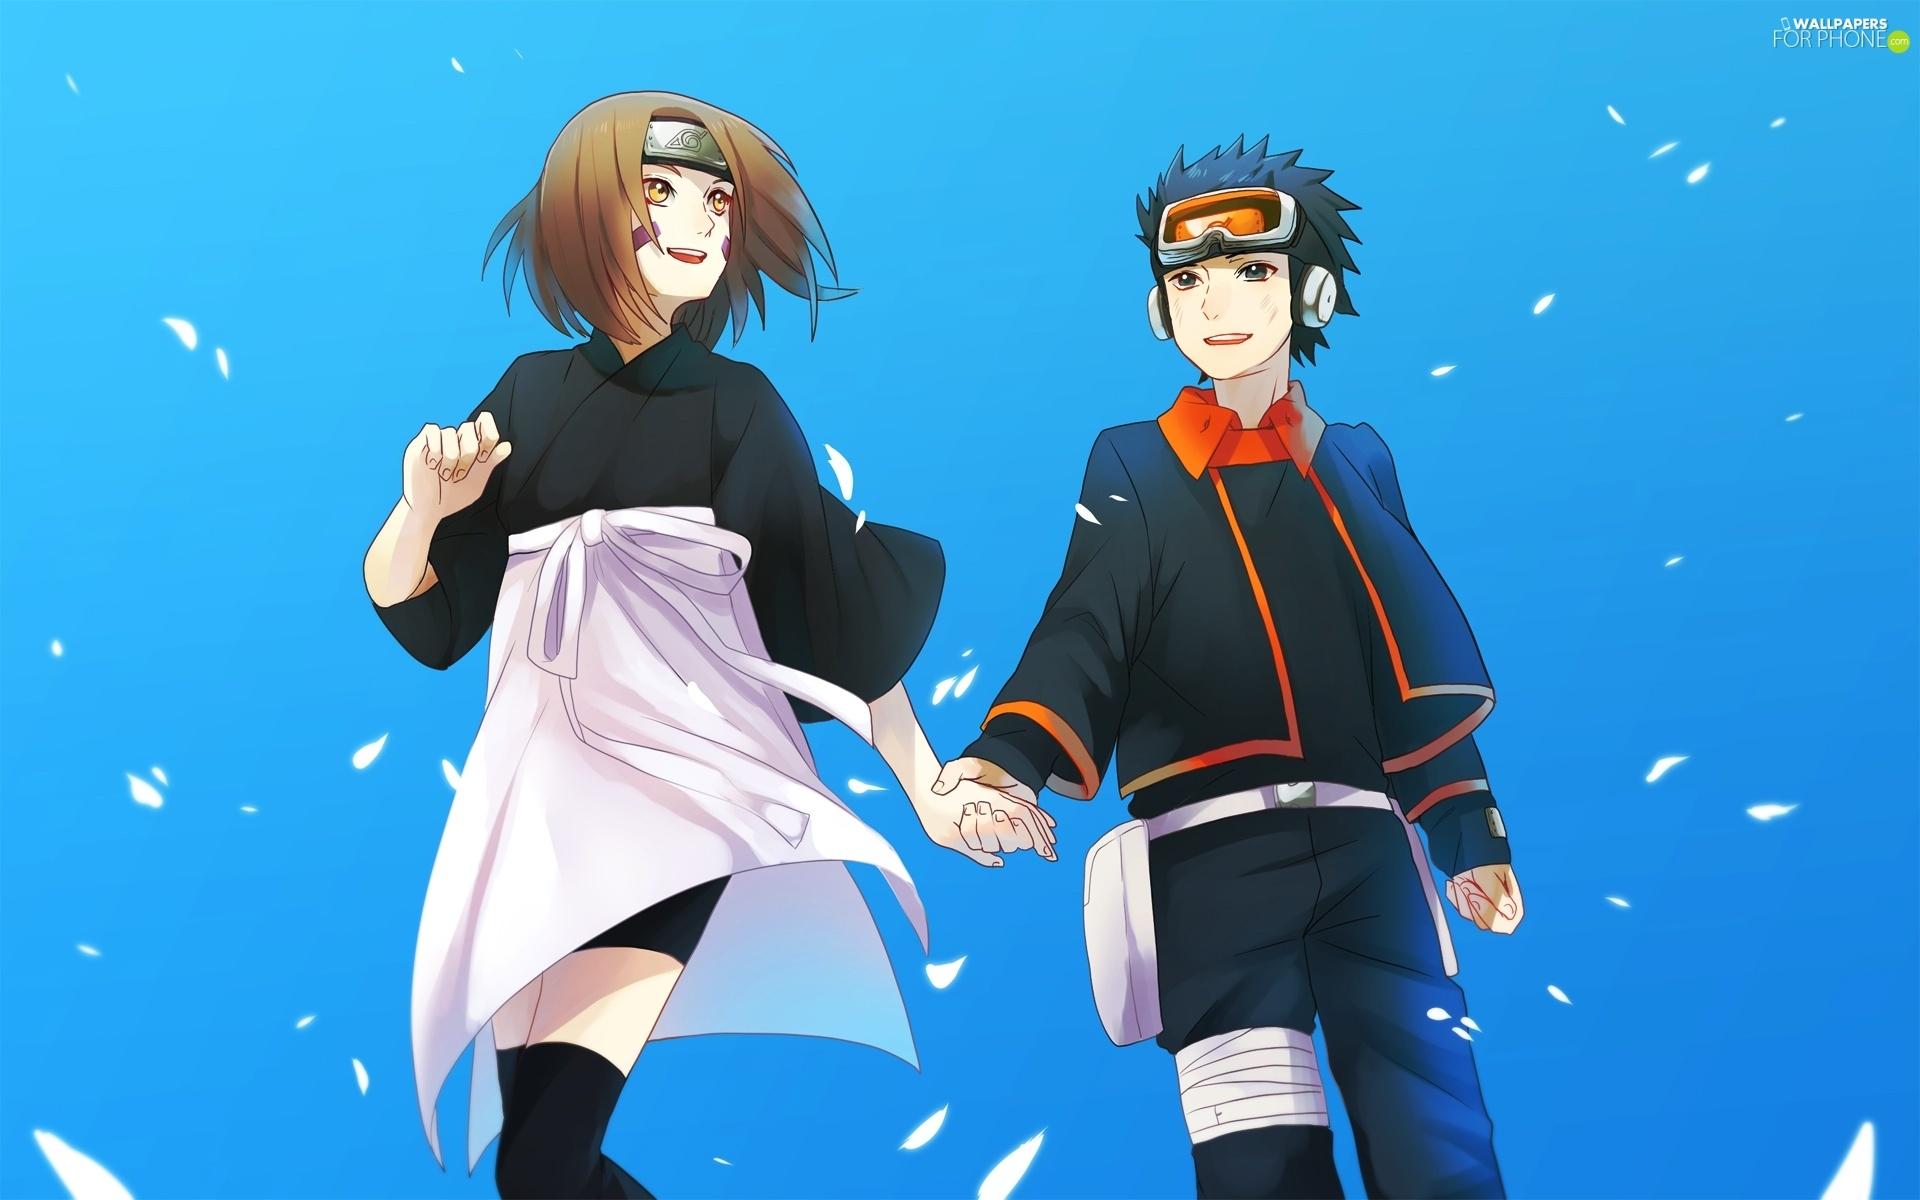 Rin Nohara Naruto Obito Uchiha   For phone wallpapers 1920x1200 1920x1200